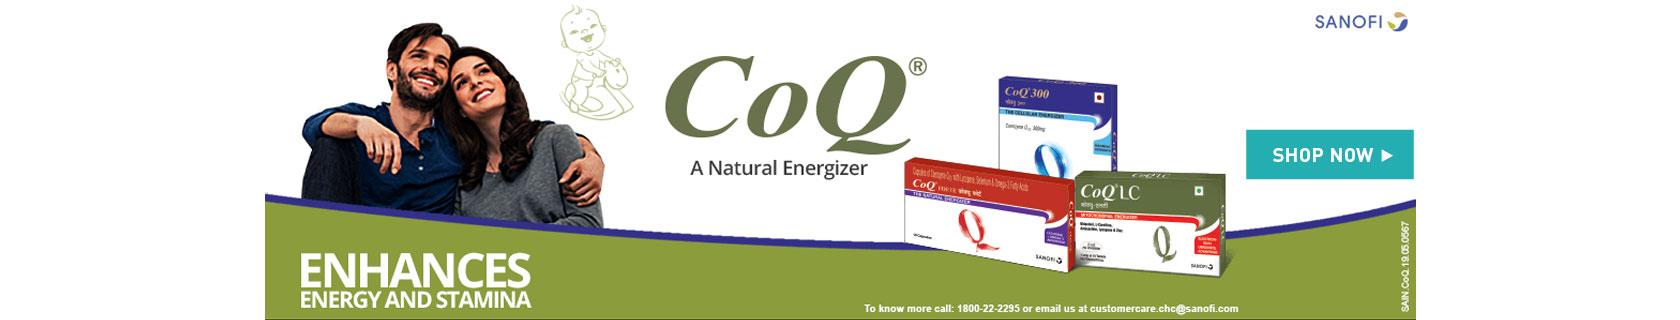 Sanofi CoQ - A Natural Energizer